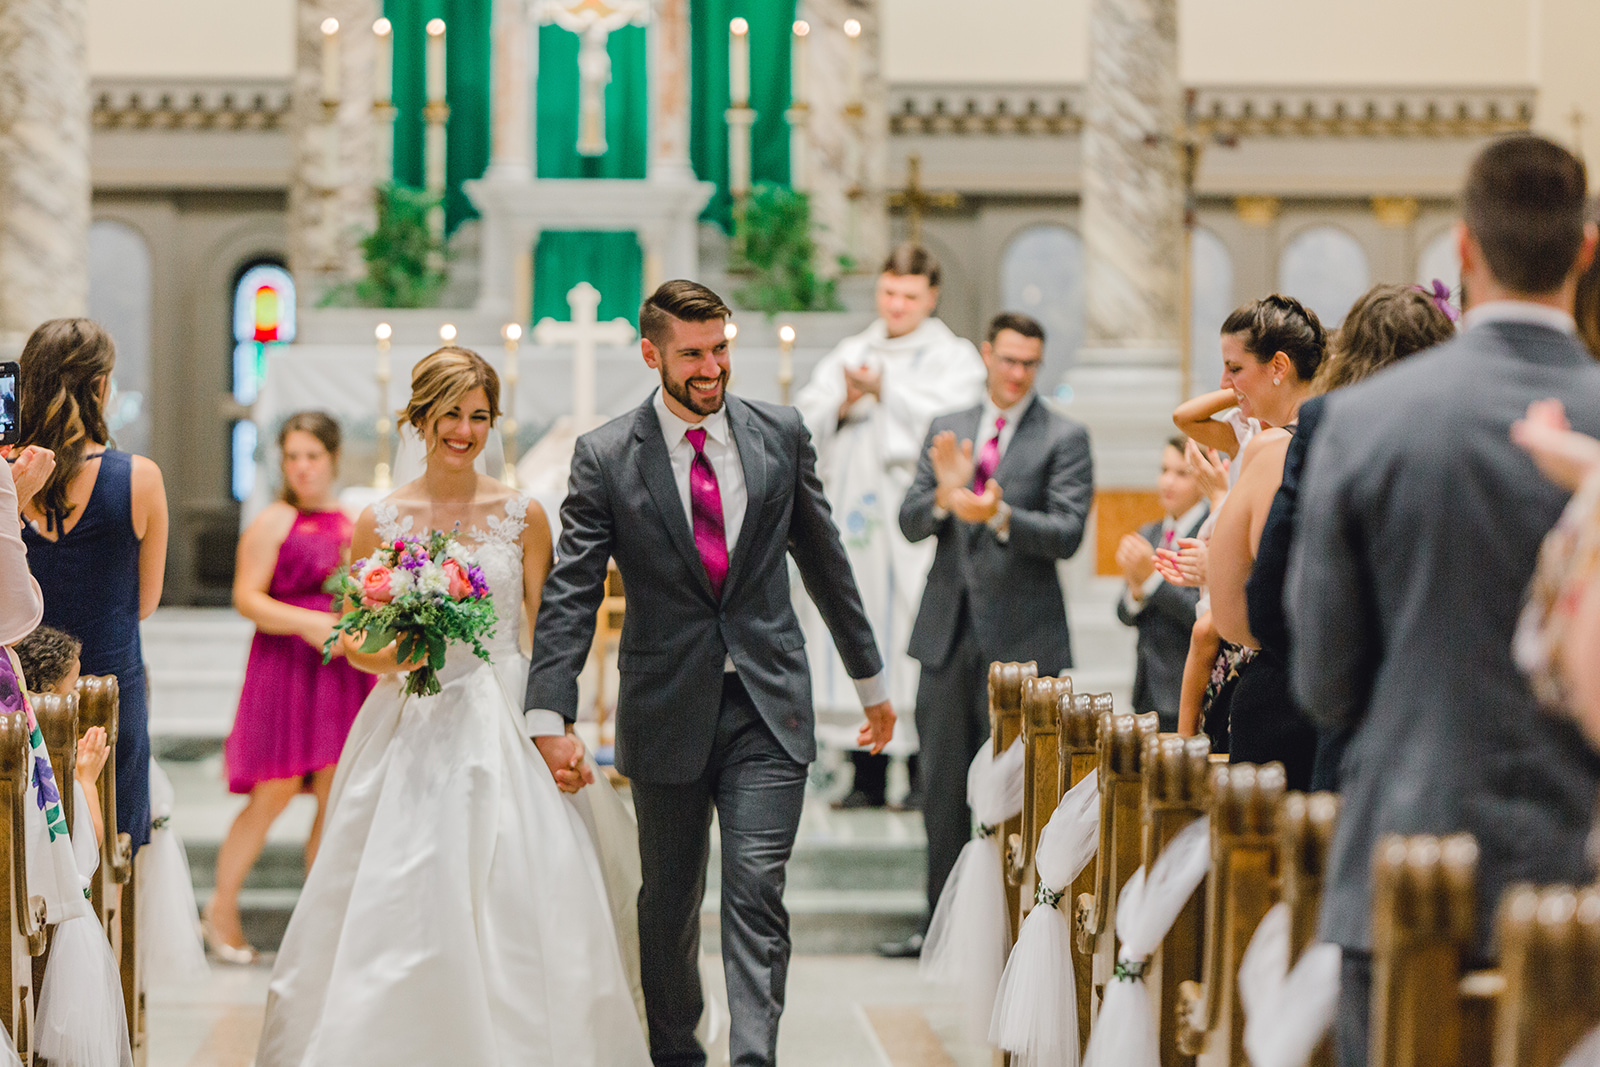 Ushers_Ferry_Cedar_Rapids_Wedding_Ella+Phil-1713.jpg